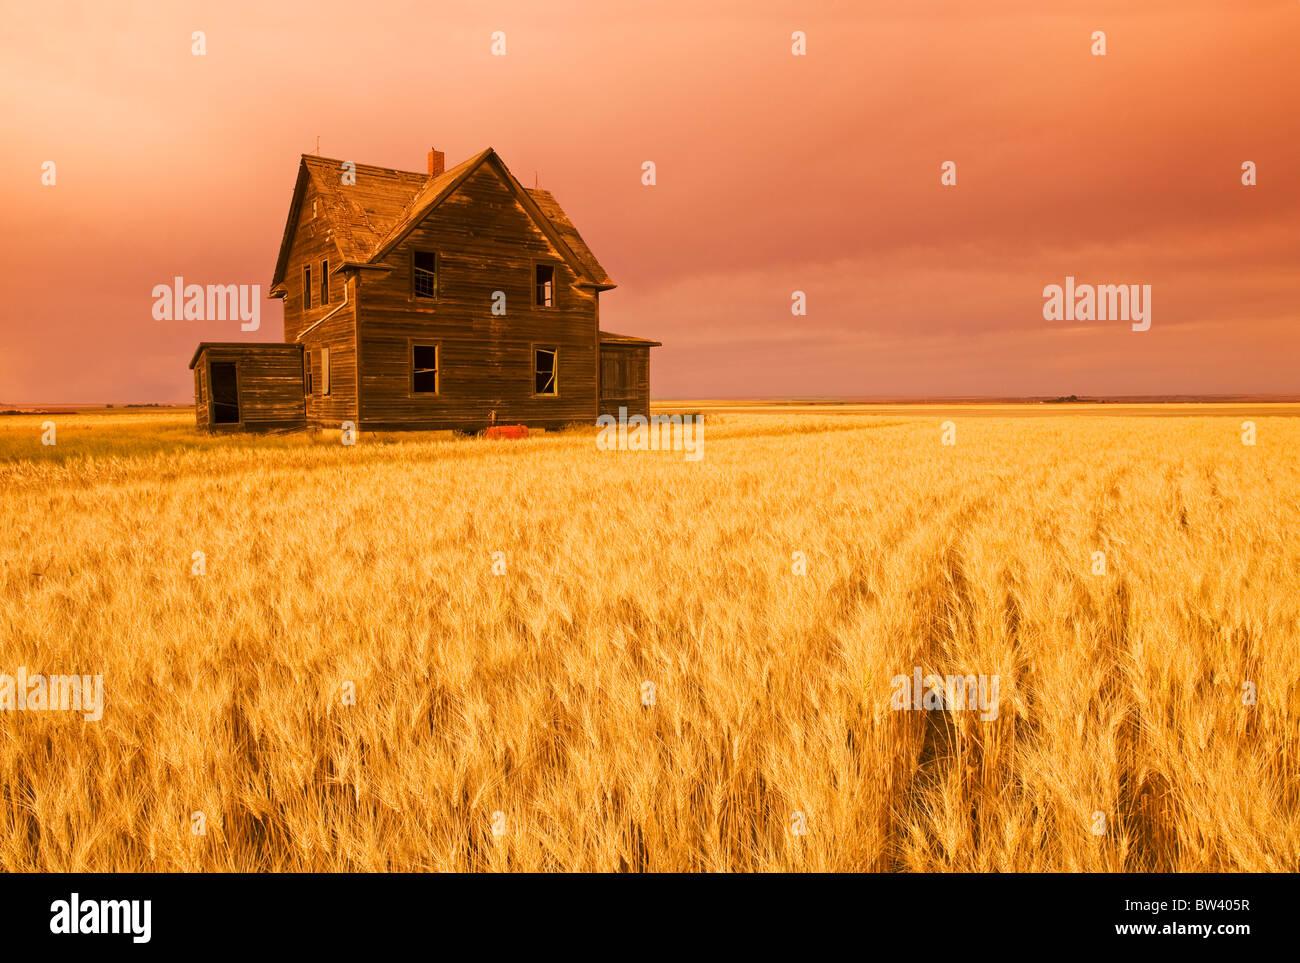 Granja abandonada Casa, viento campo de trigo duro cerca de Assiniboia, Saskatchewan Imagen De Stock